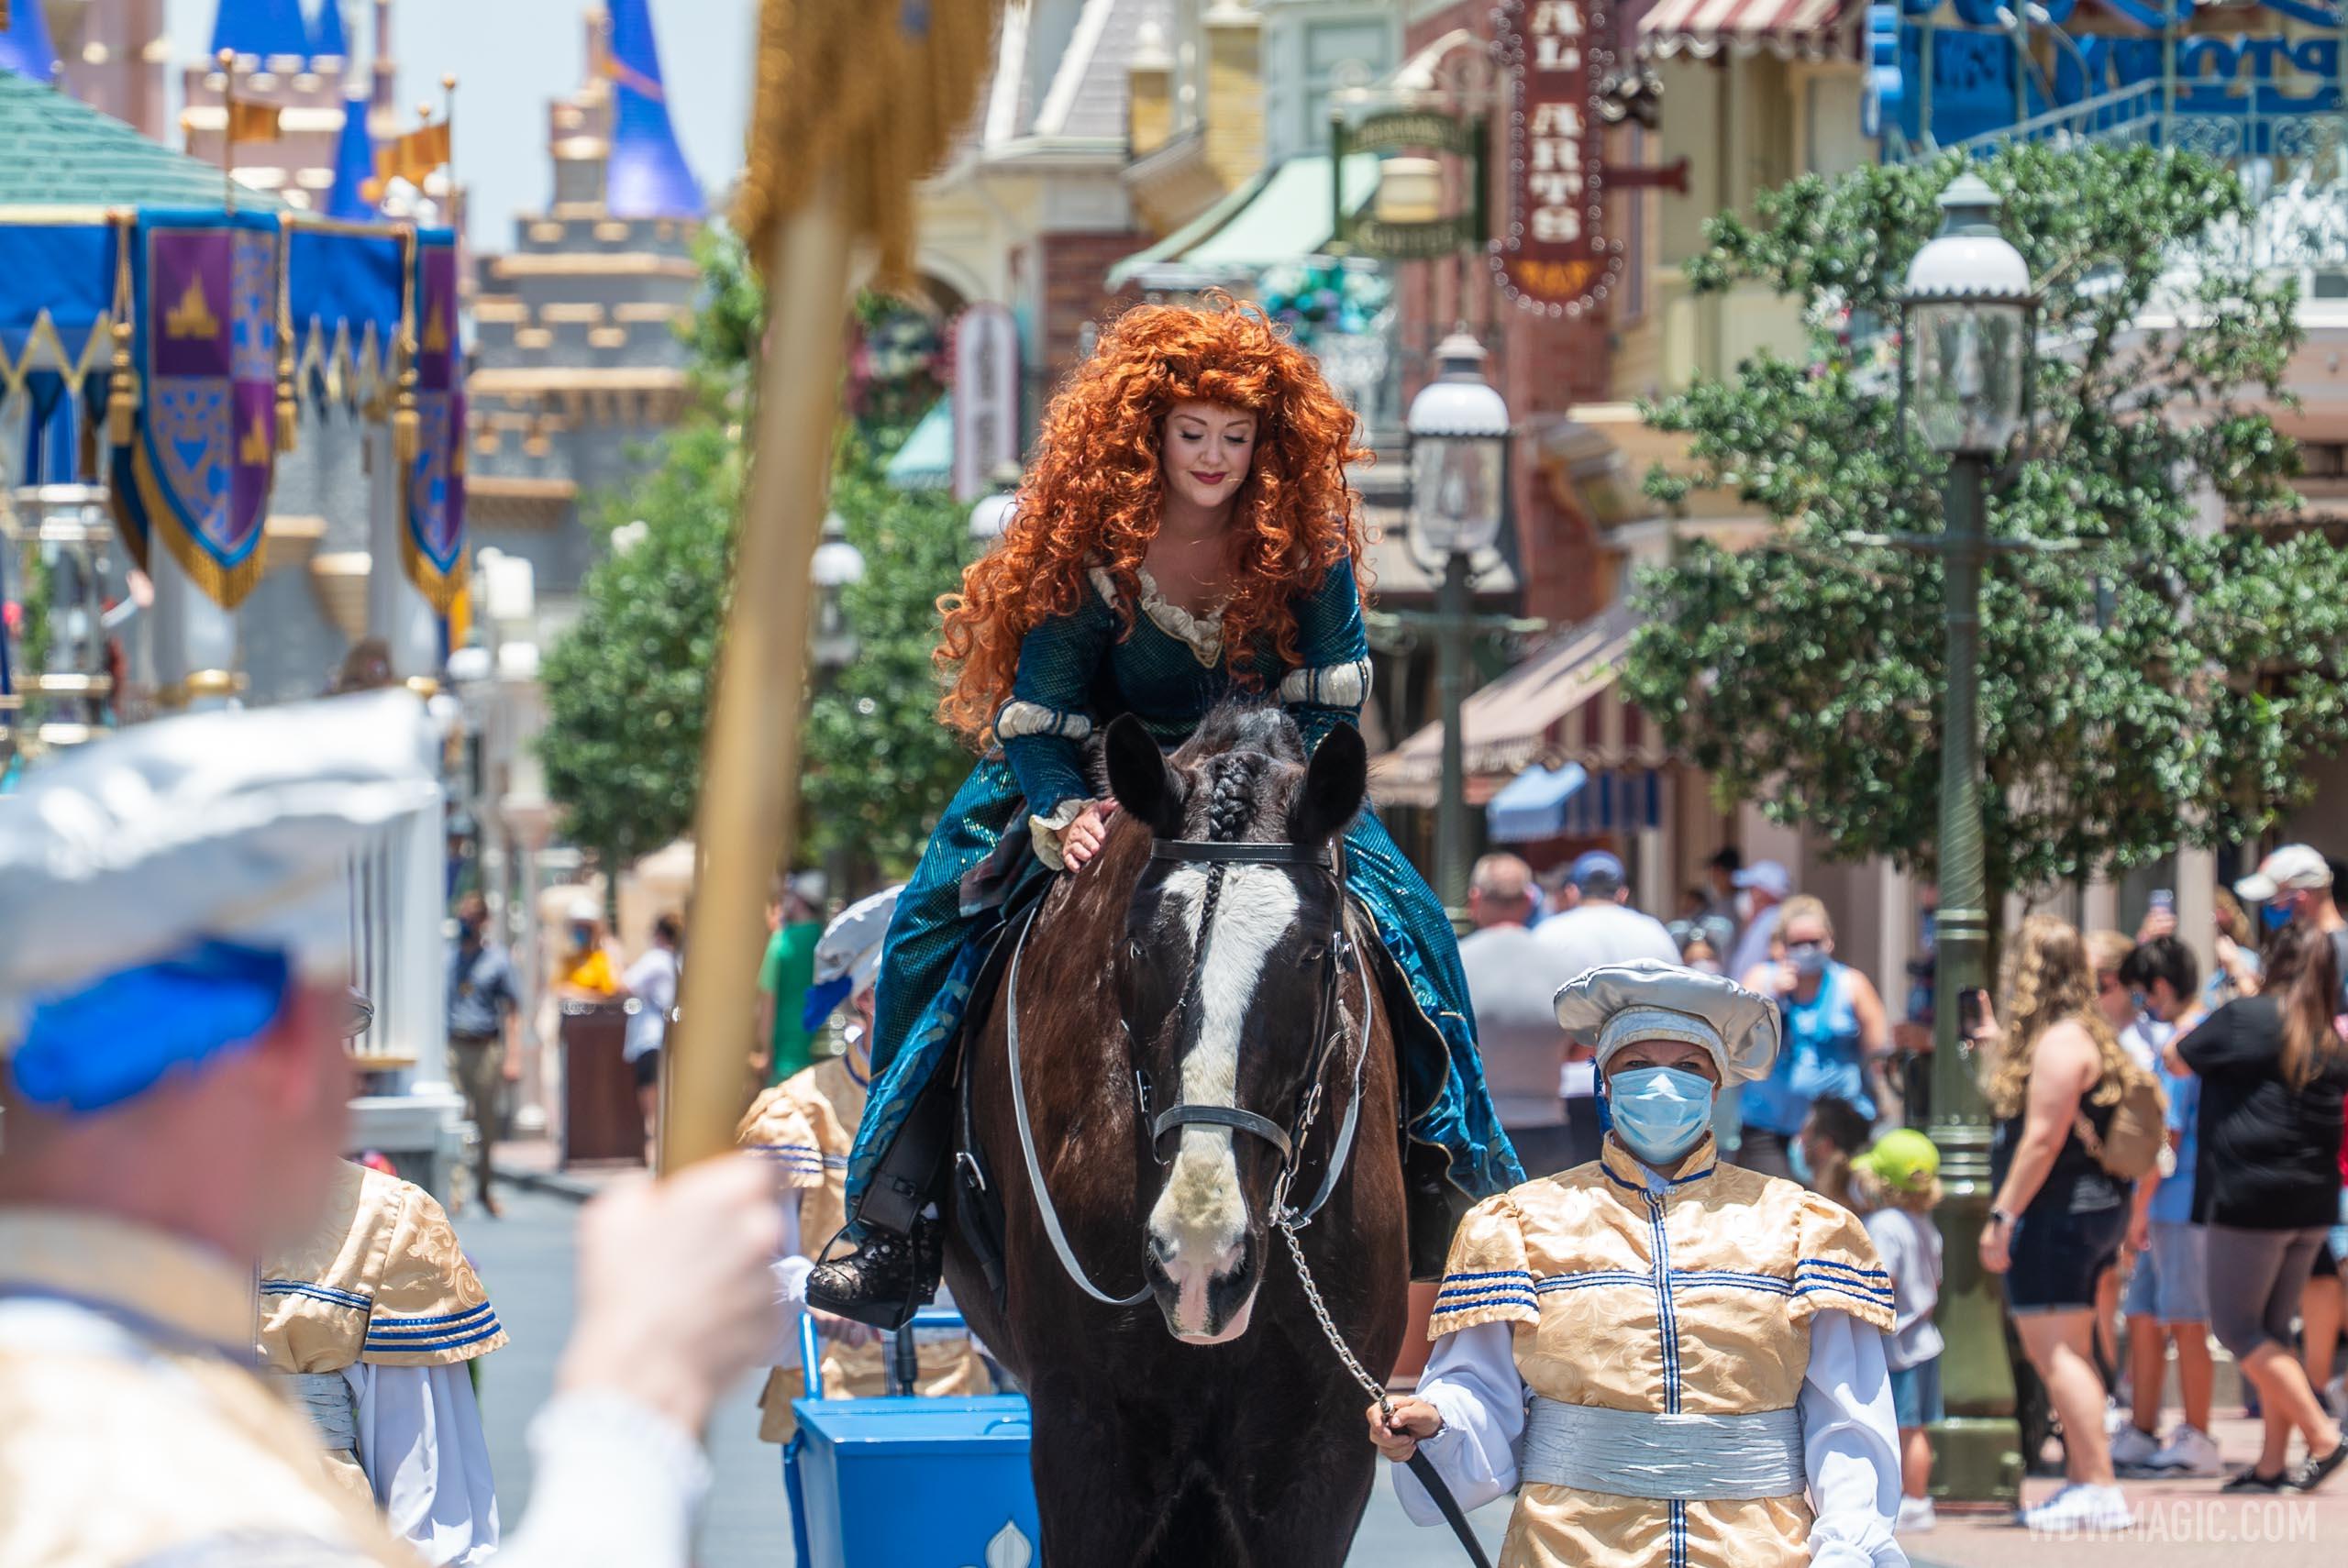 Merida in the Princess cavalcade